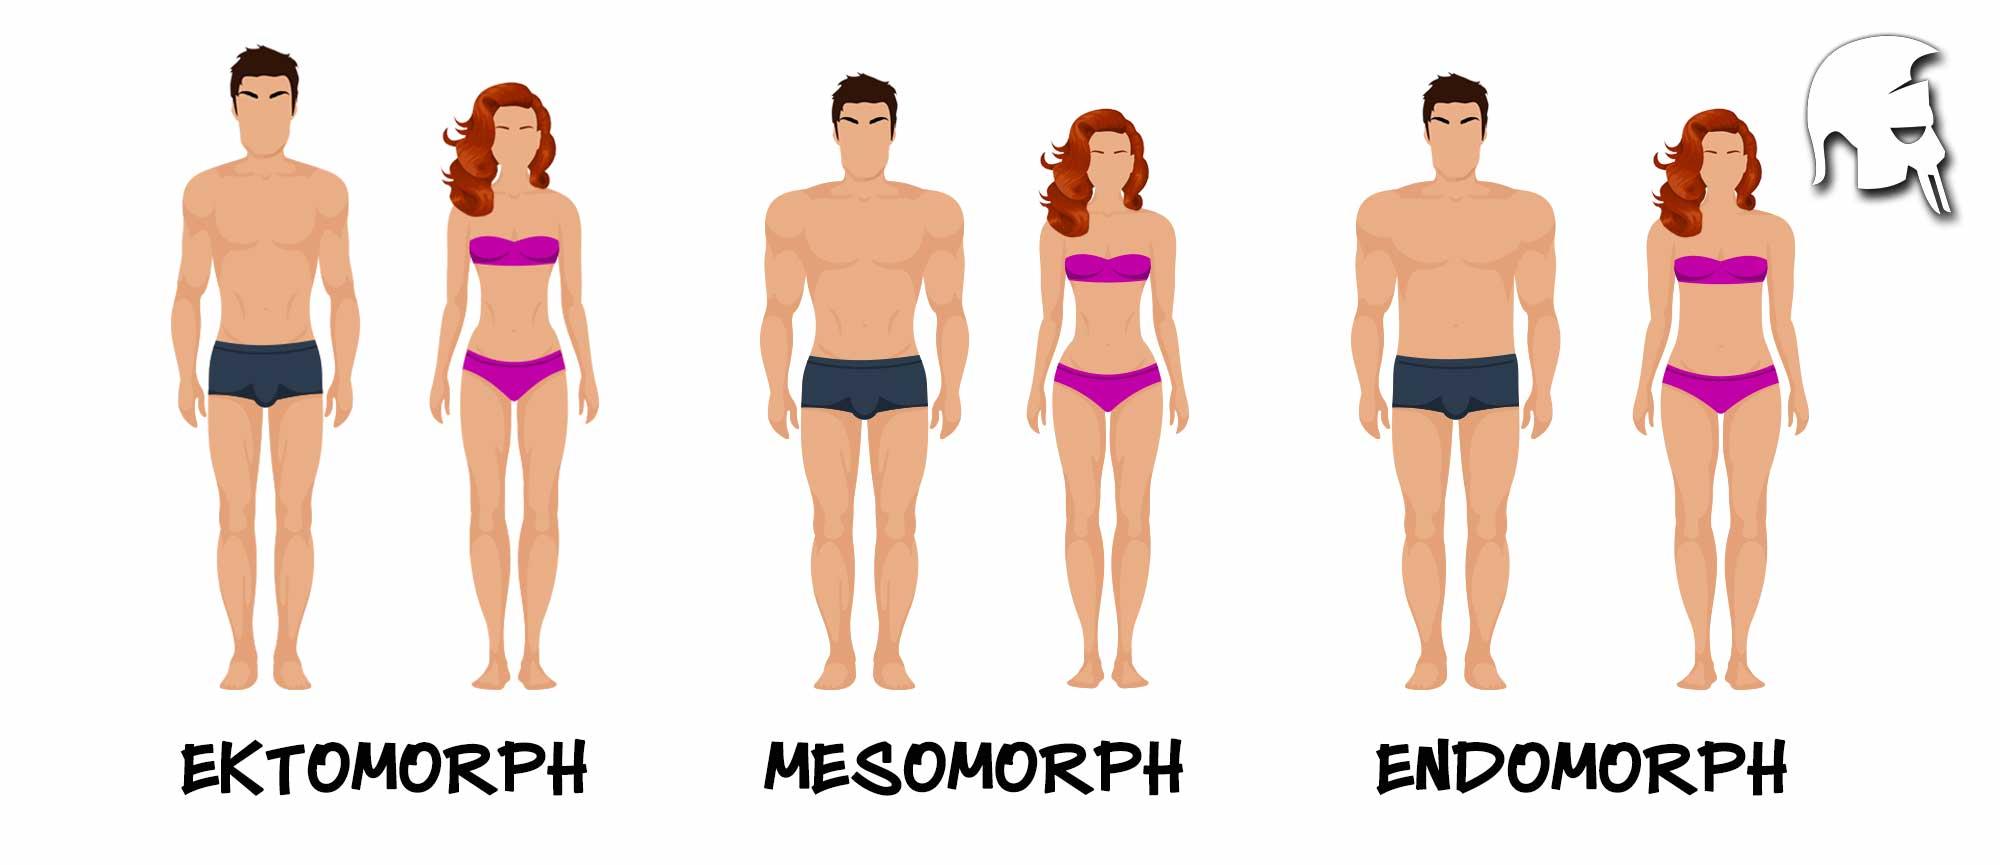 Ektomorph, Endomorph, Mesomorph